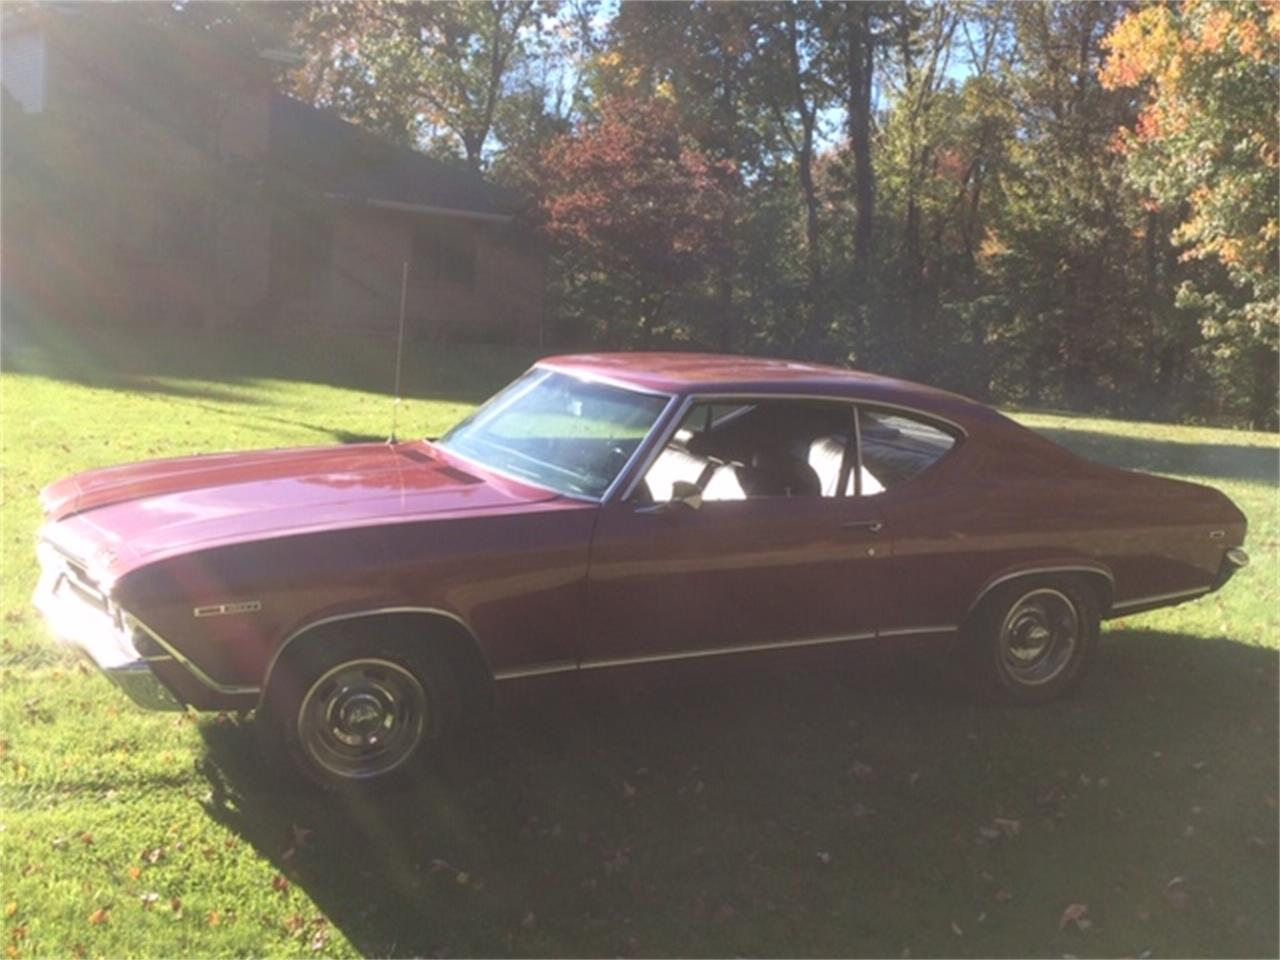 1969 Chevrolet Chevelle Malibu (CC-1388500) for sale in Newtown, Connecticut